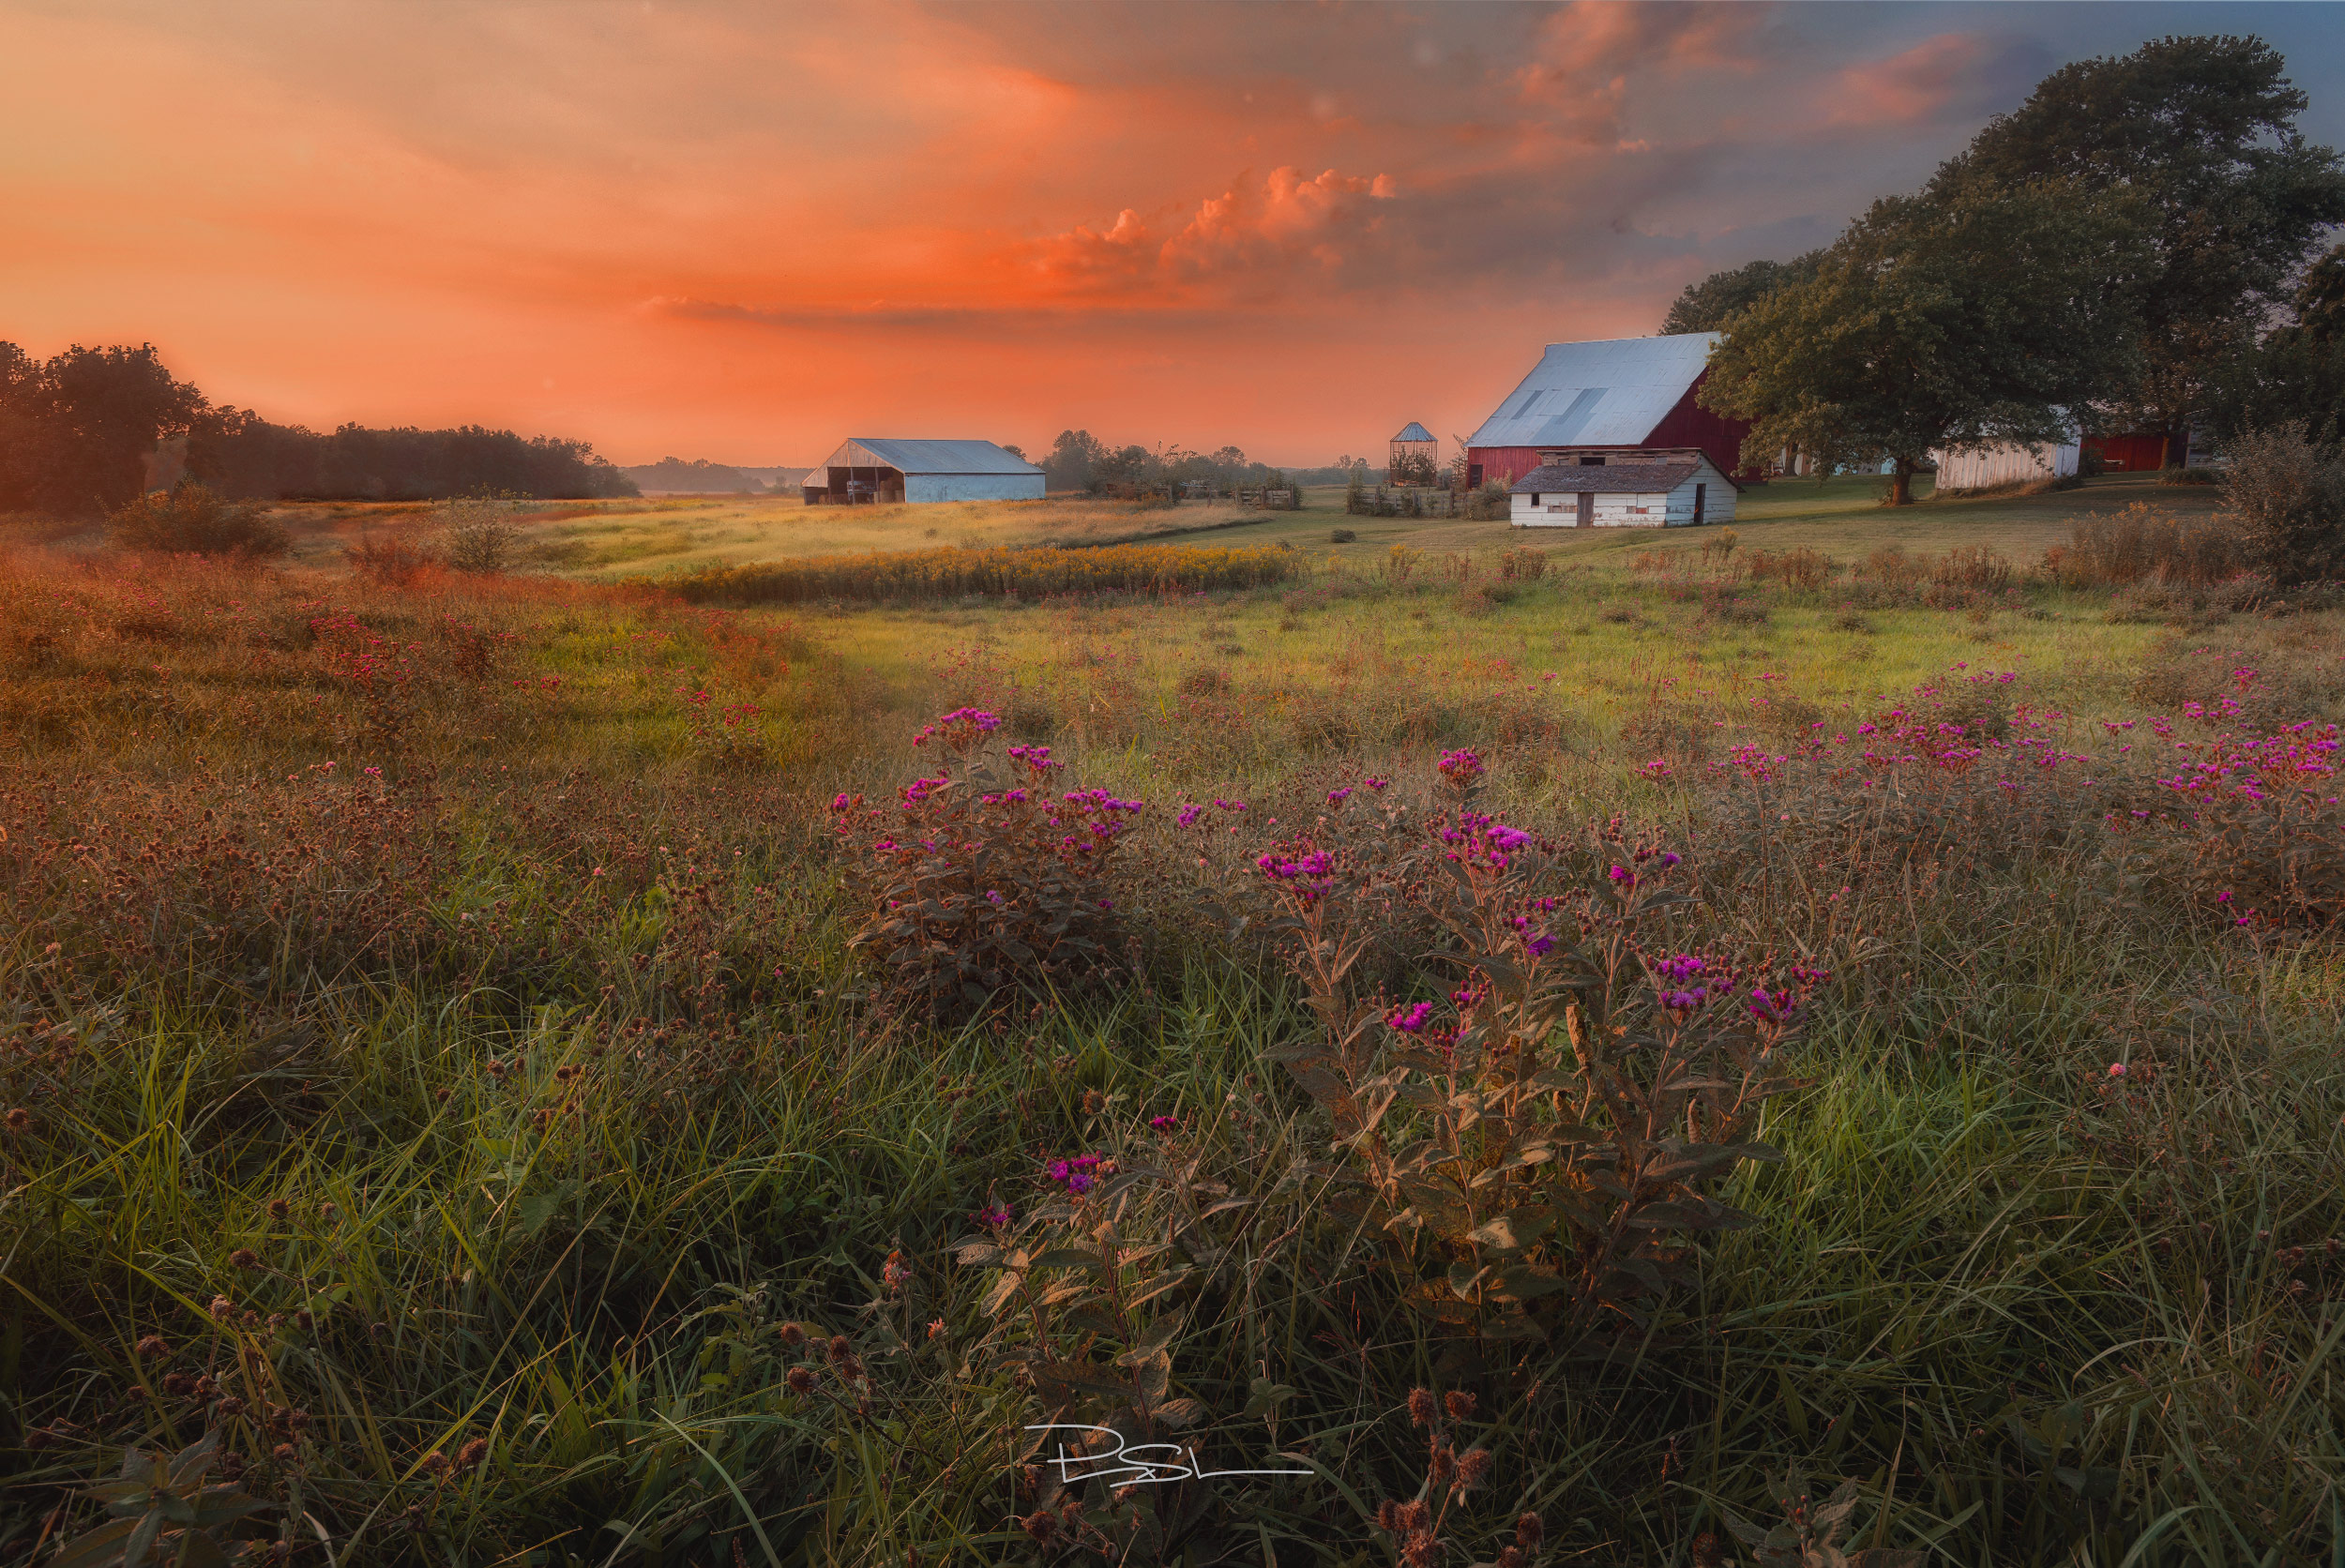 Brushy Mound - midwestern barn at sunset